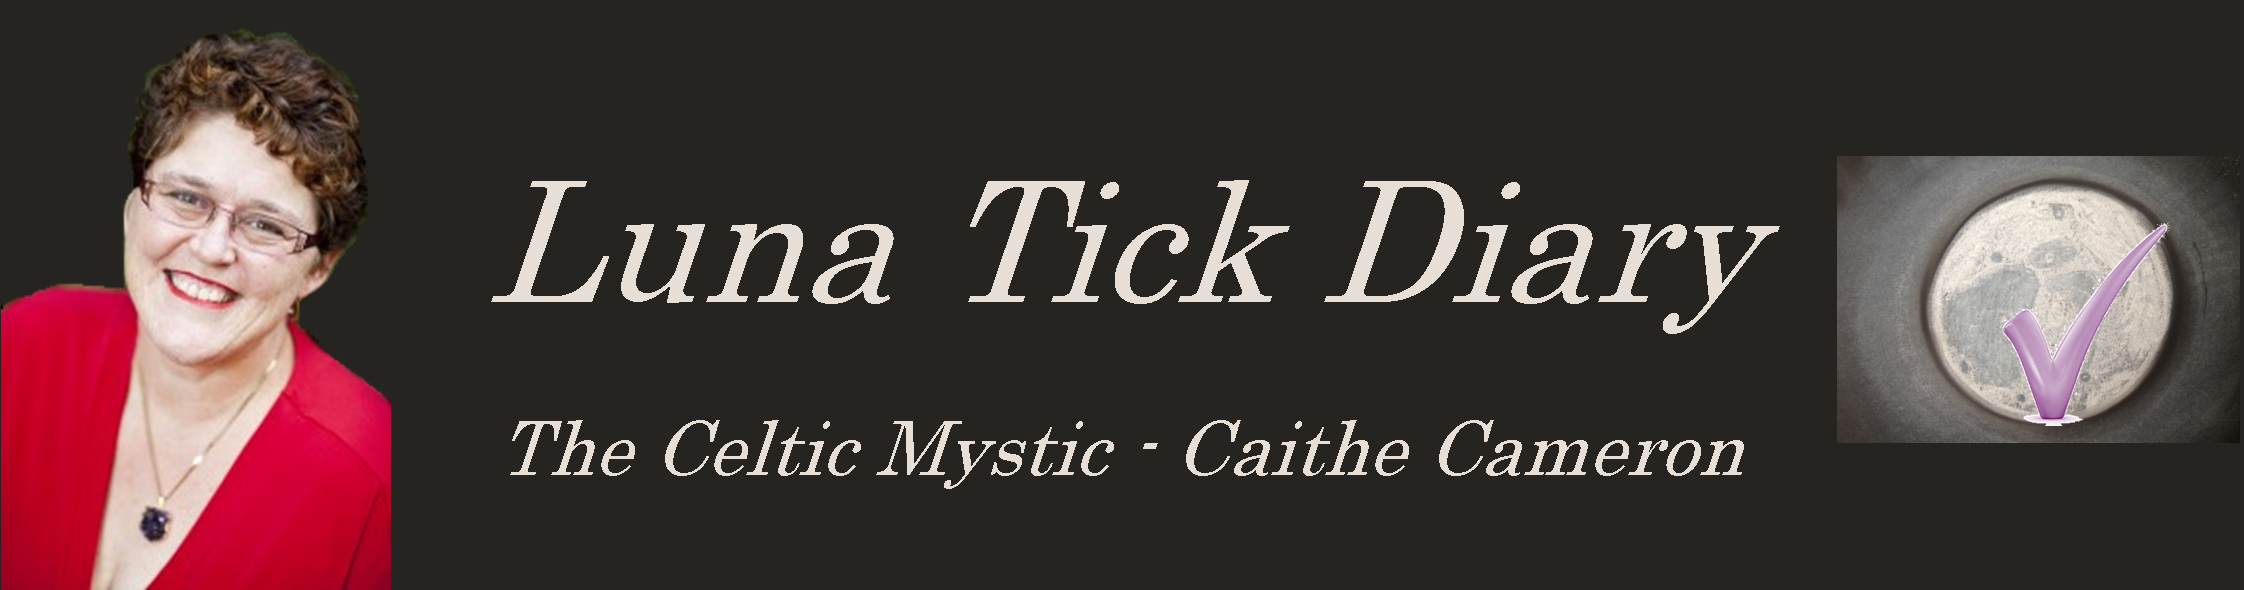 Luna Tick Diary